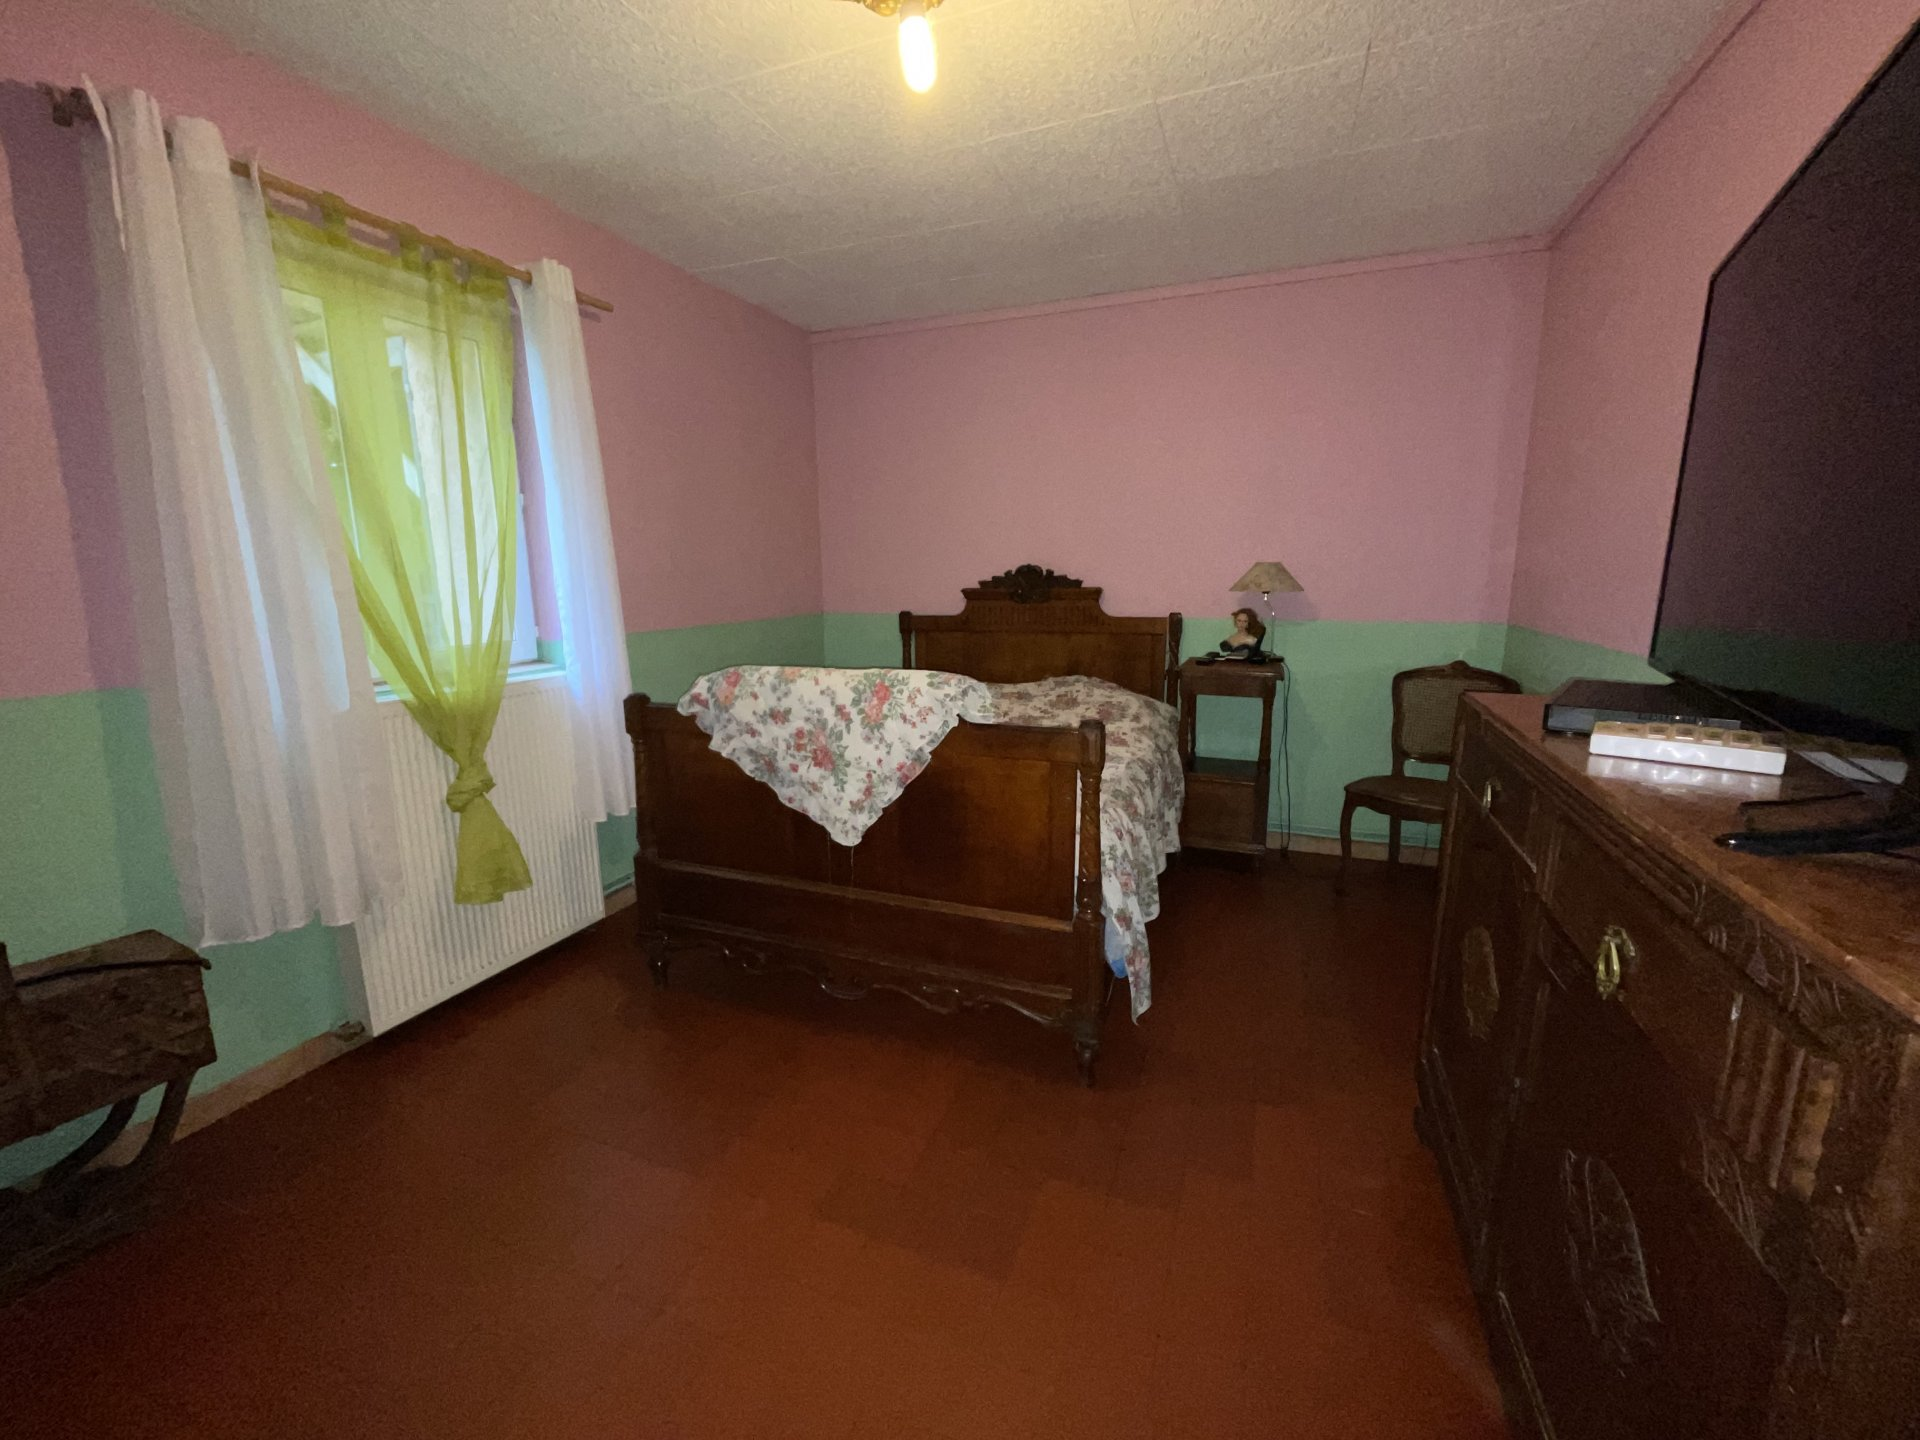 Maison 5 chambres, posez vos meubles !